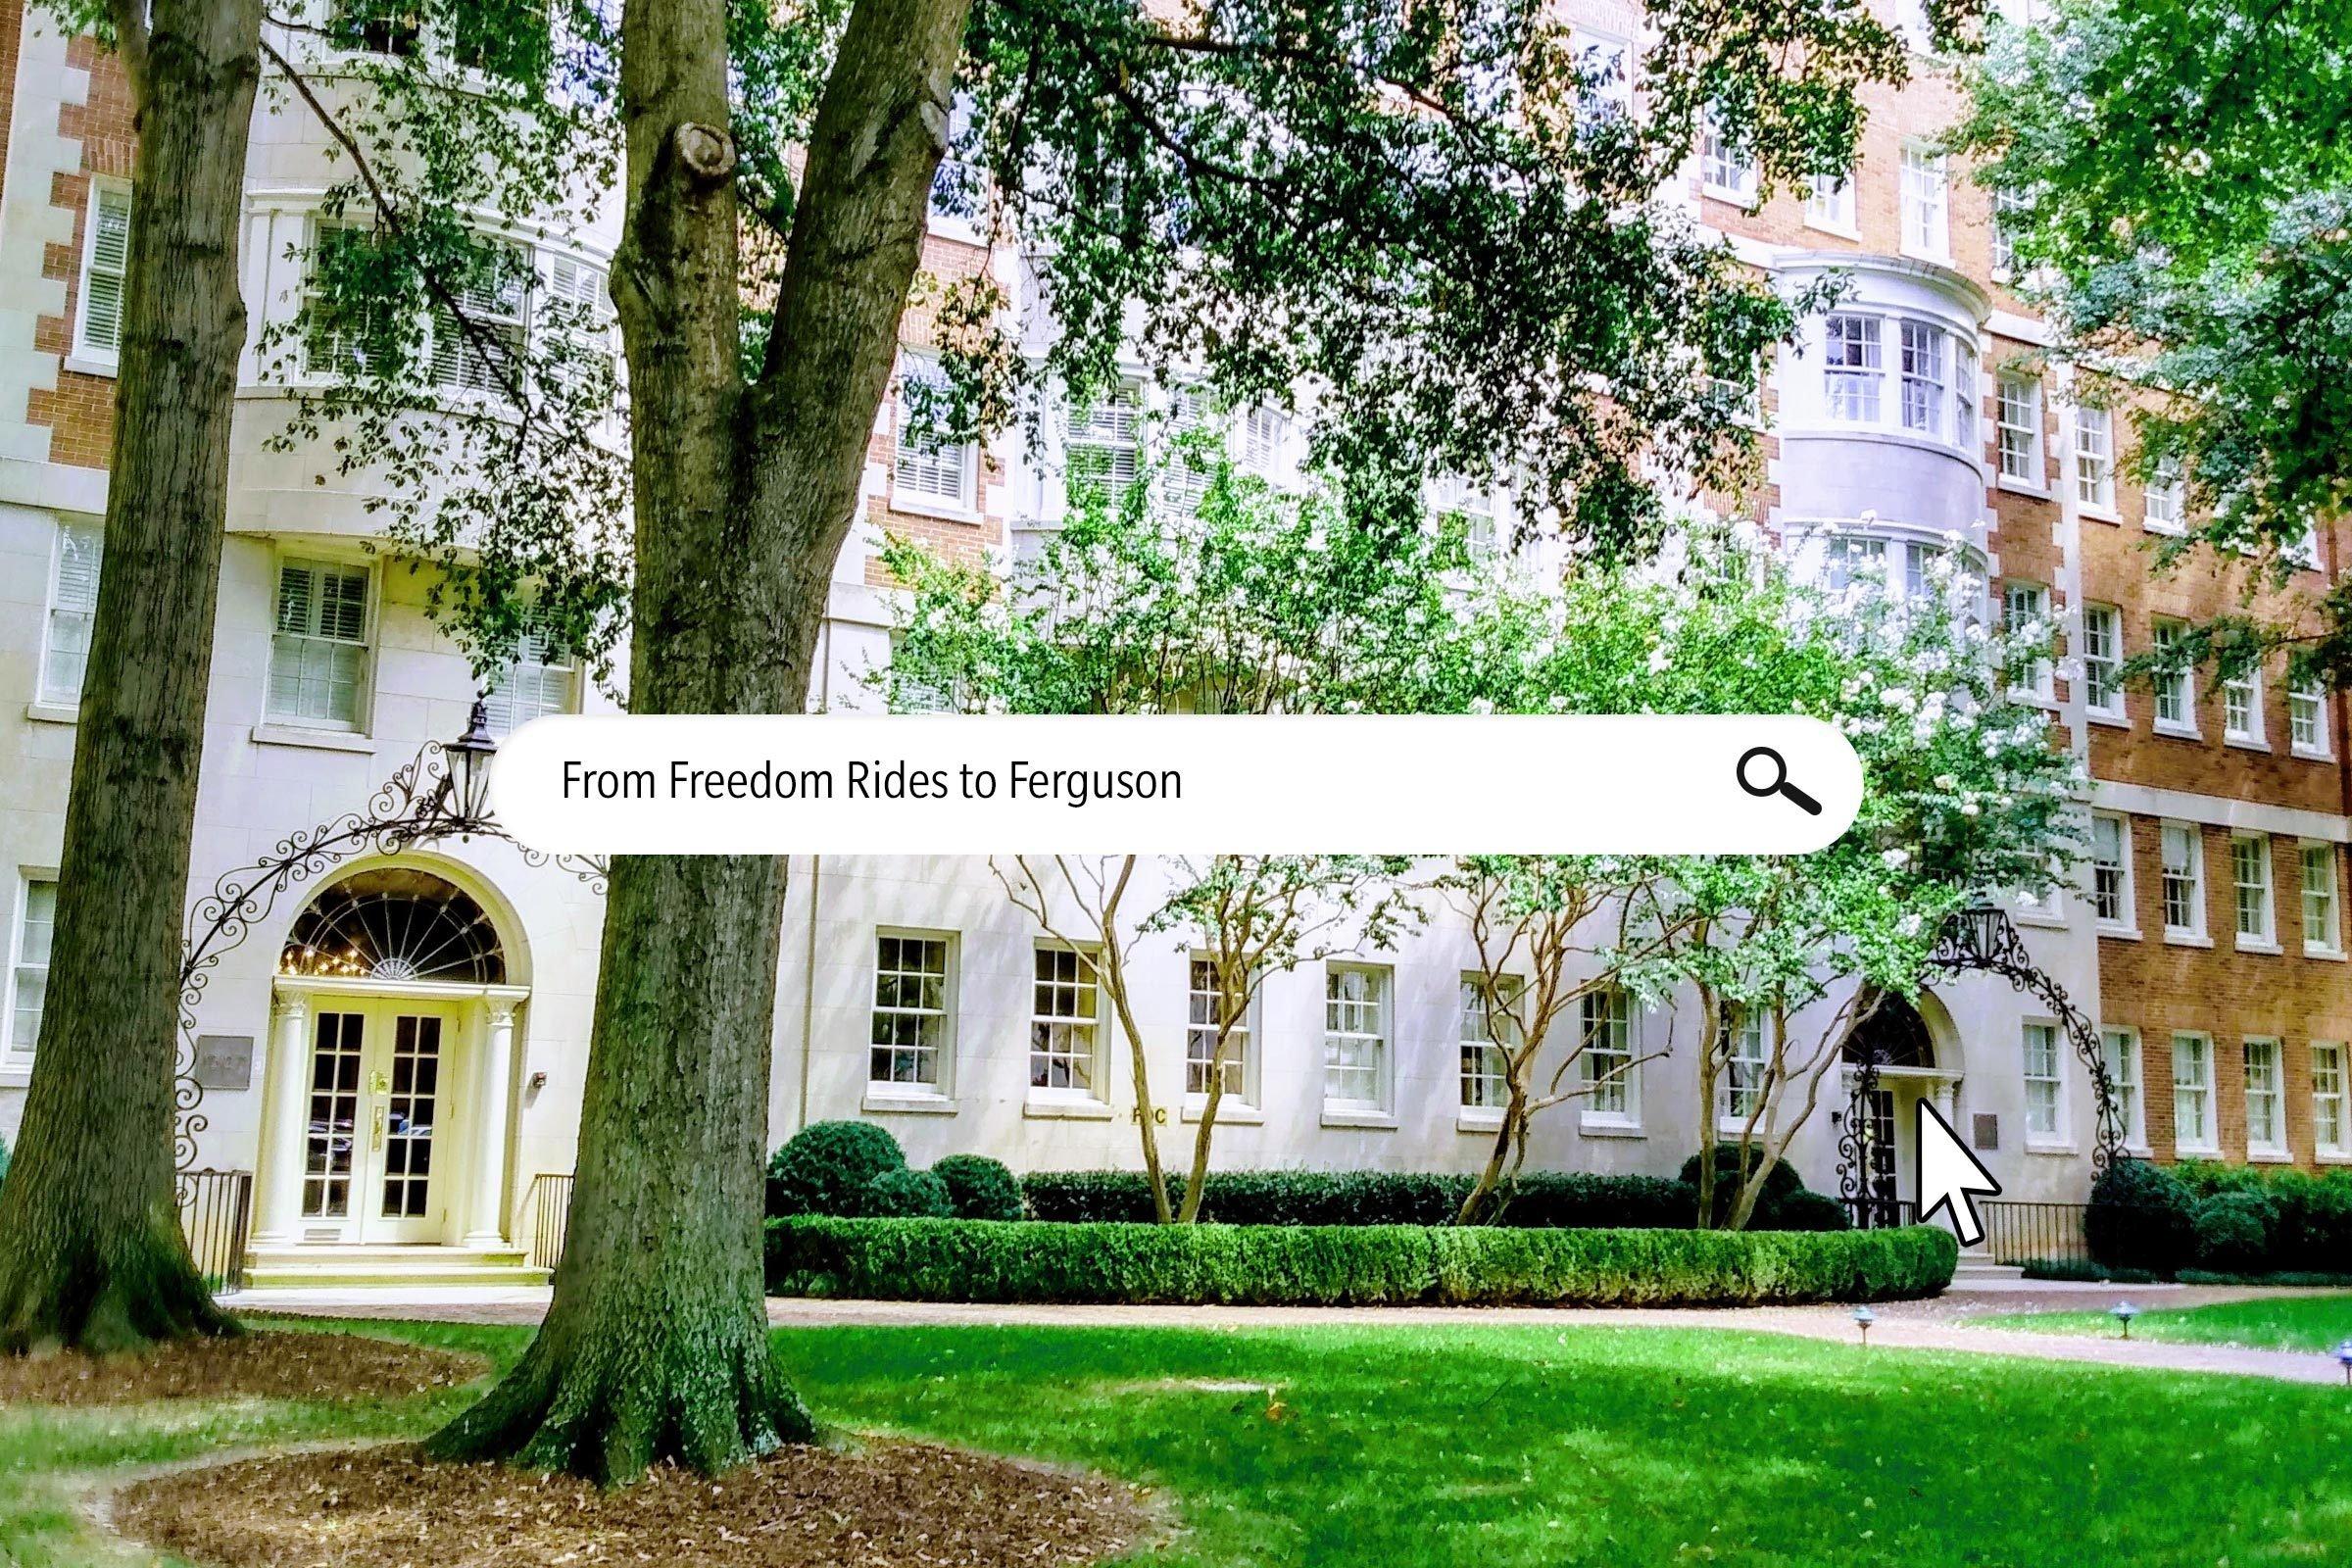 From Freedom Rides to Ferguson (Emory University)